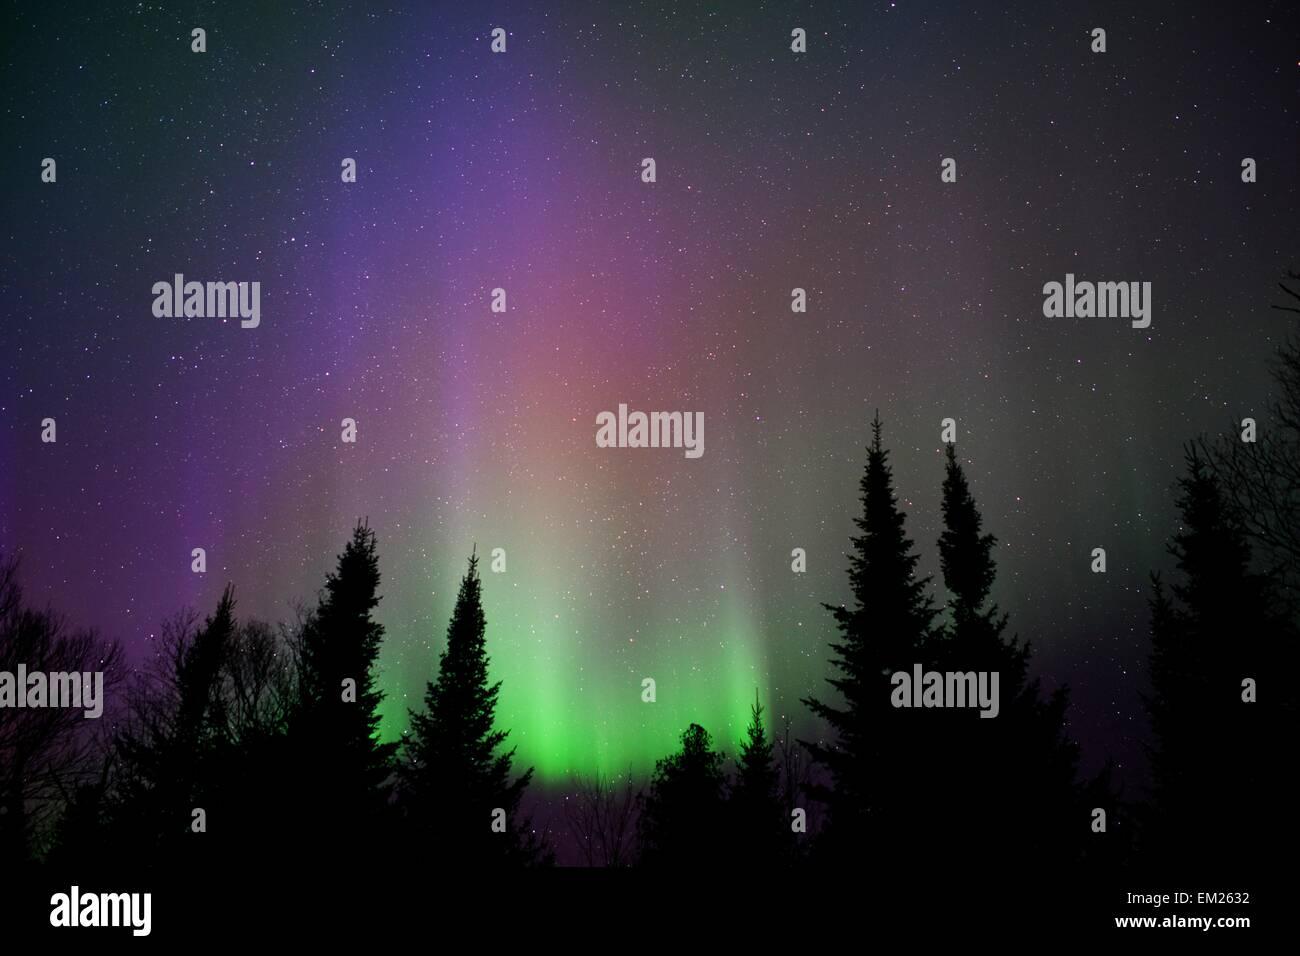 northern lights aurora borealis shimmer stock photos northern